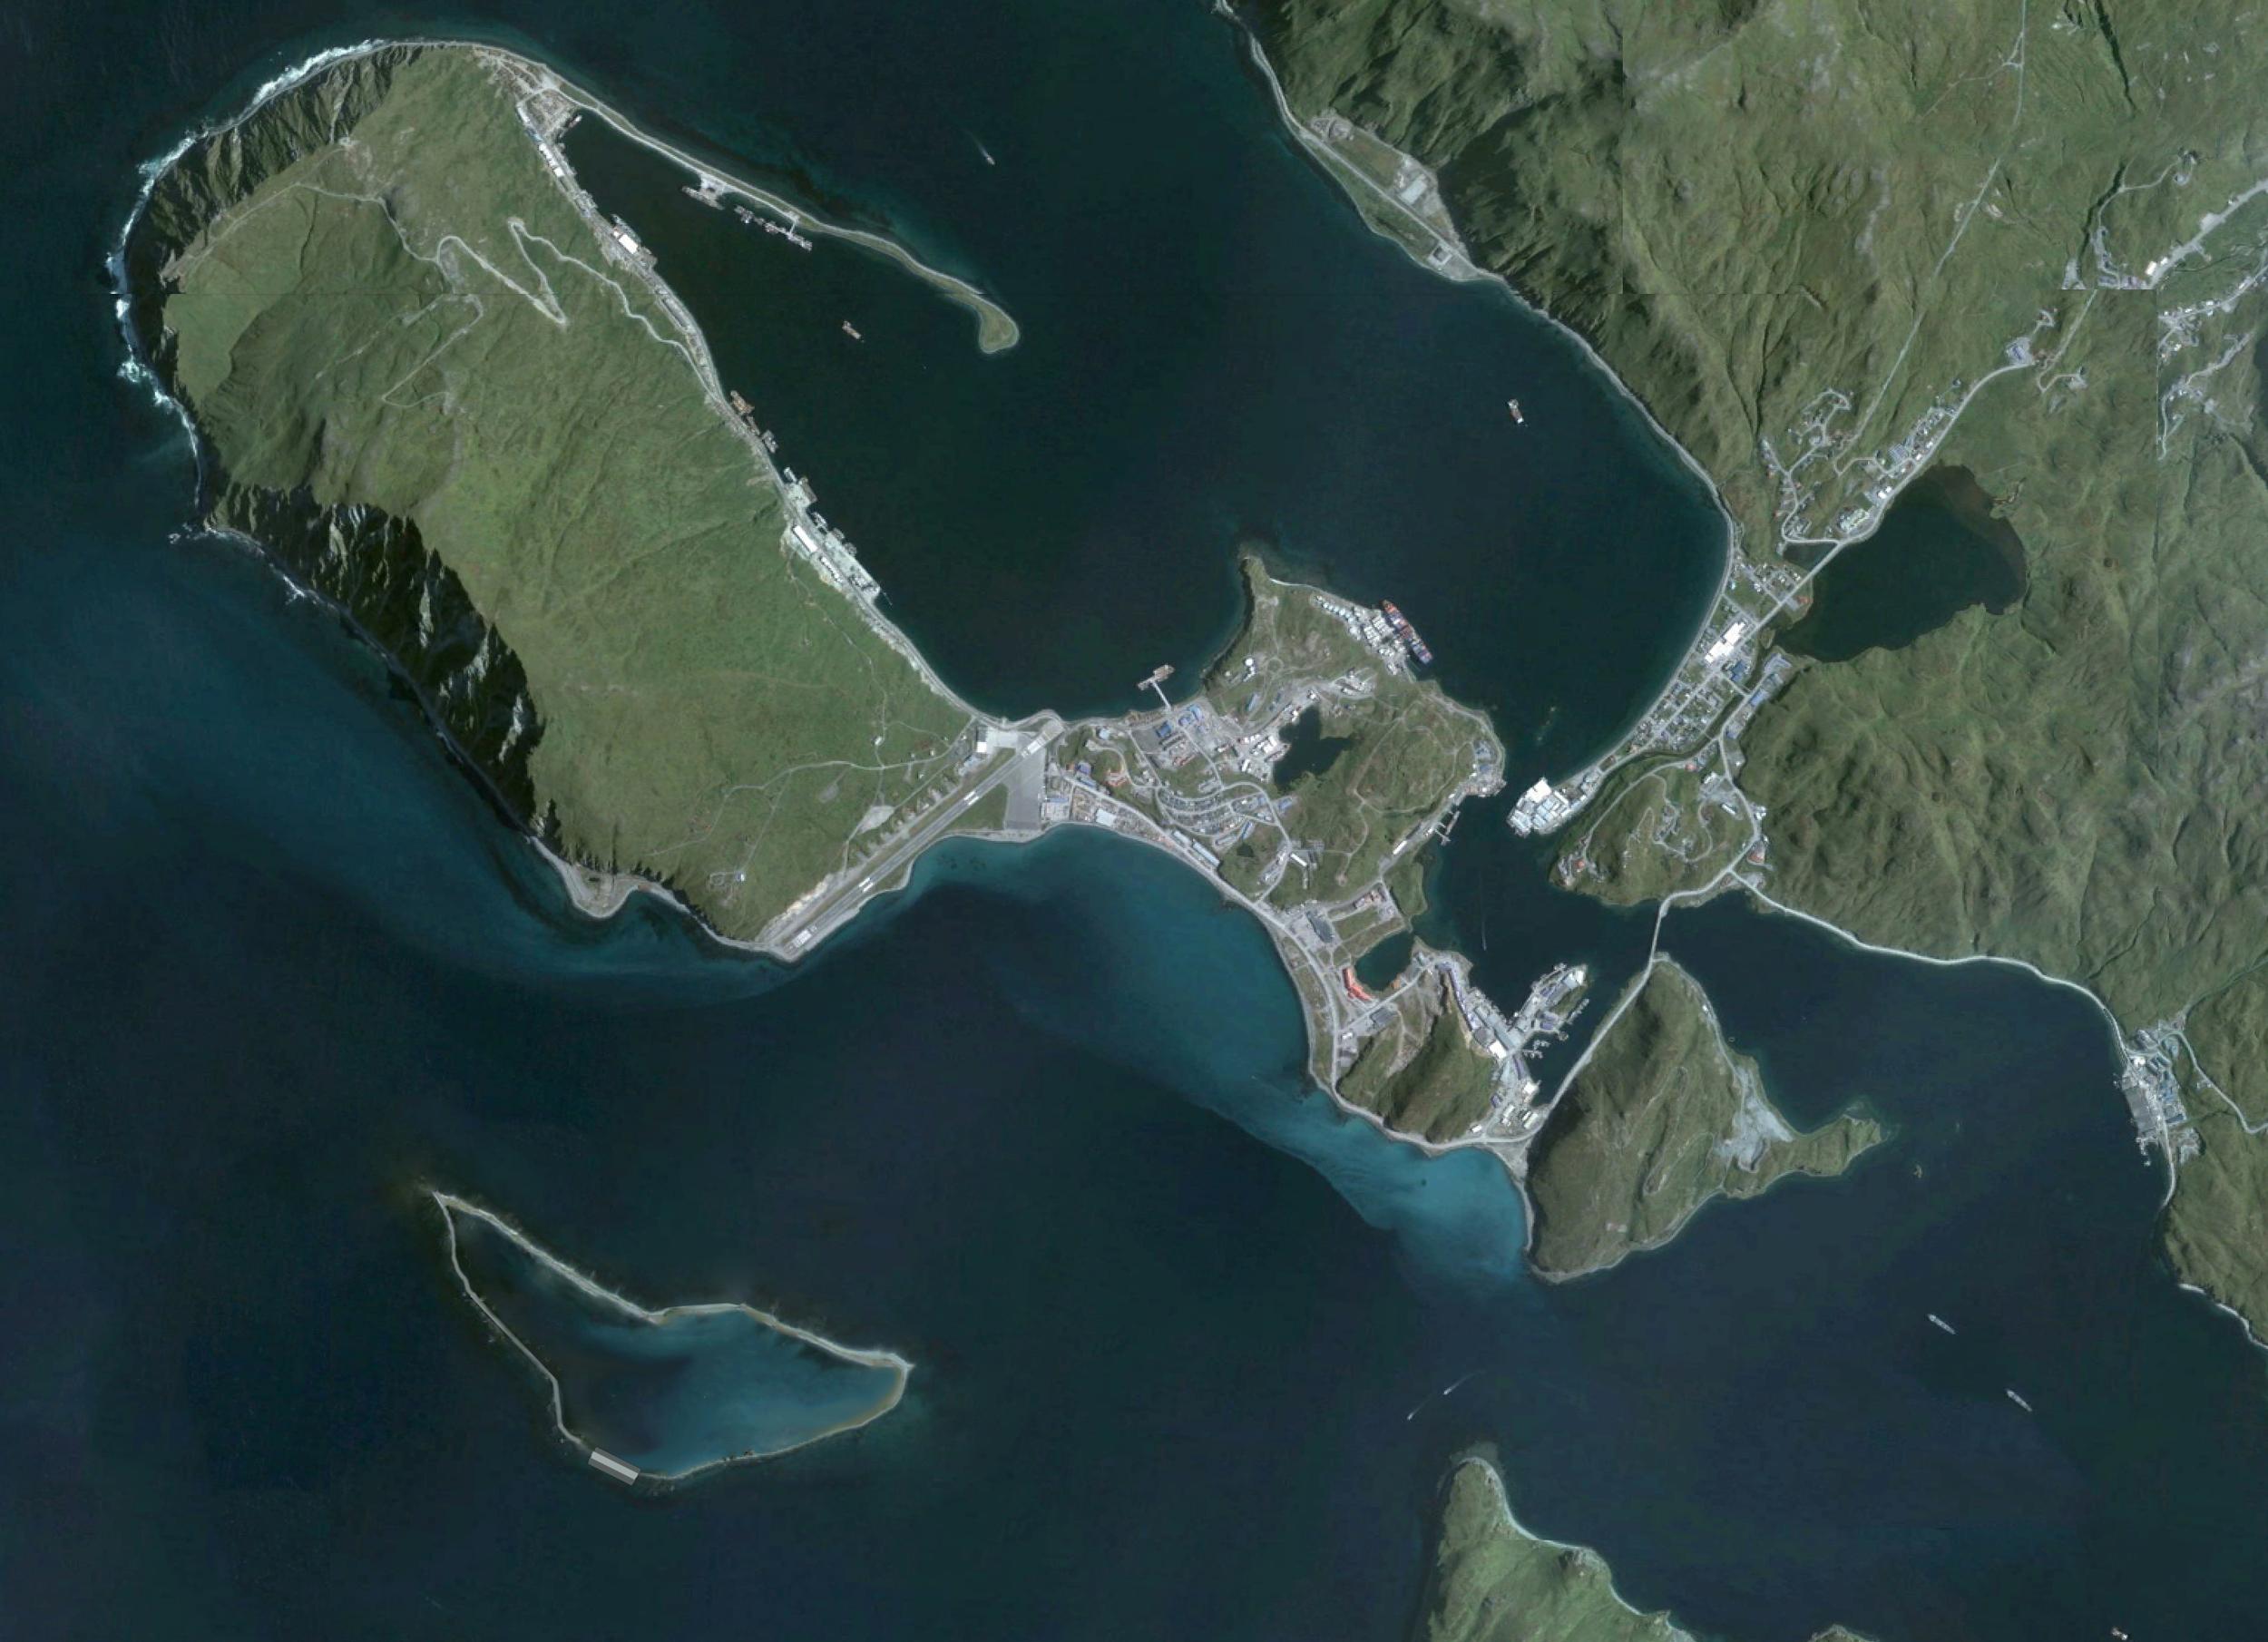 satelliteLagoon cropped 2.jpg